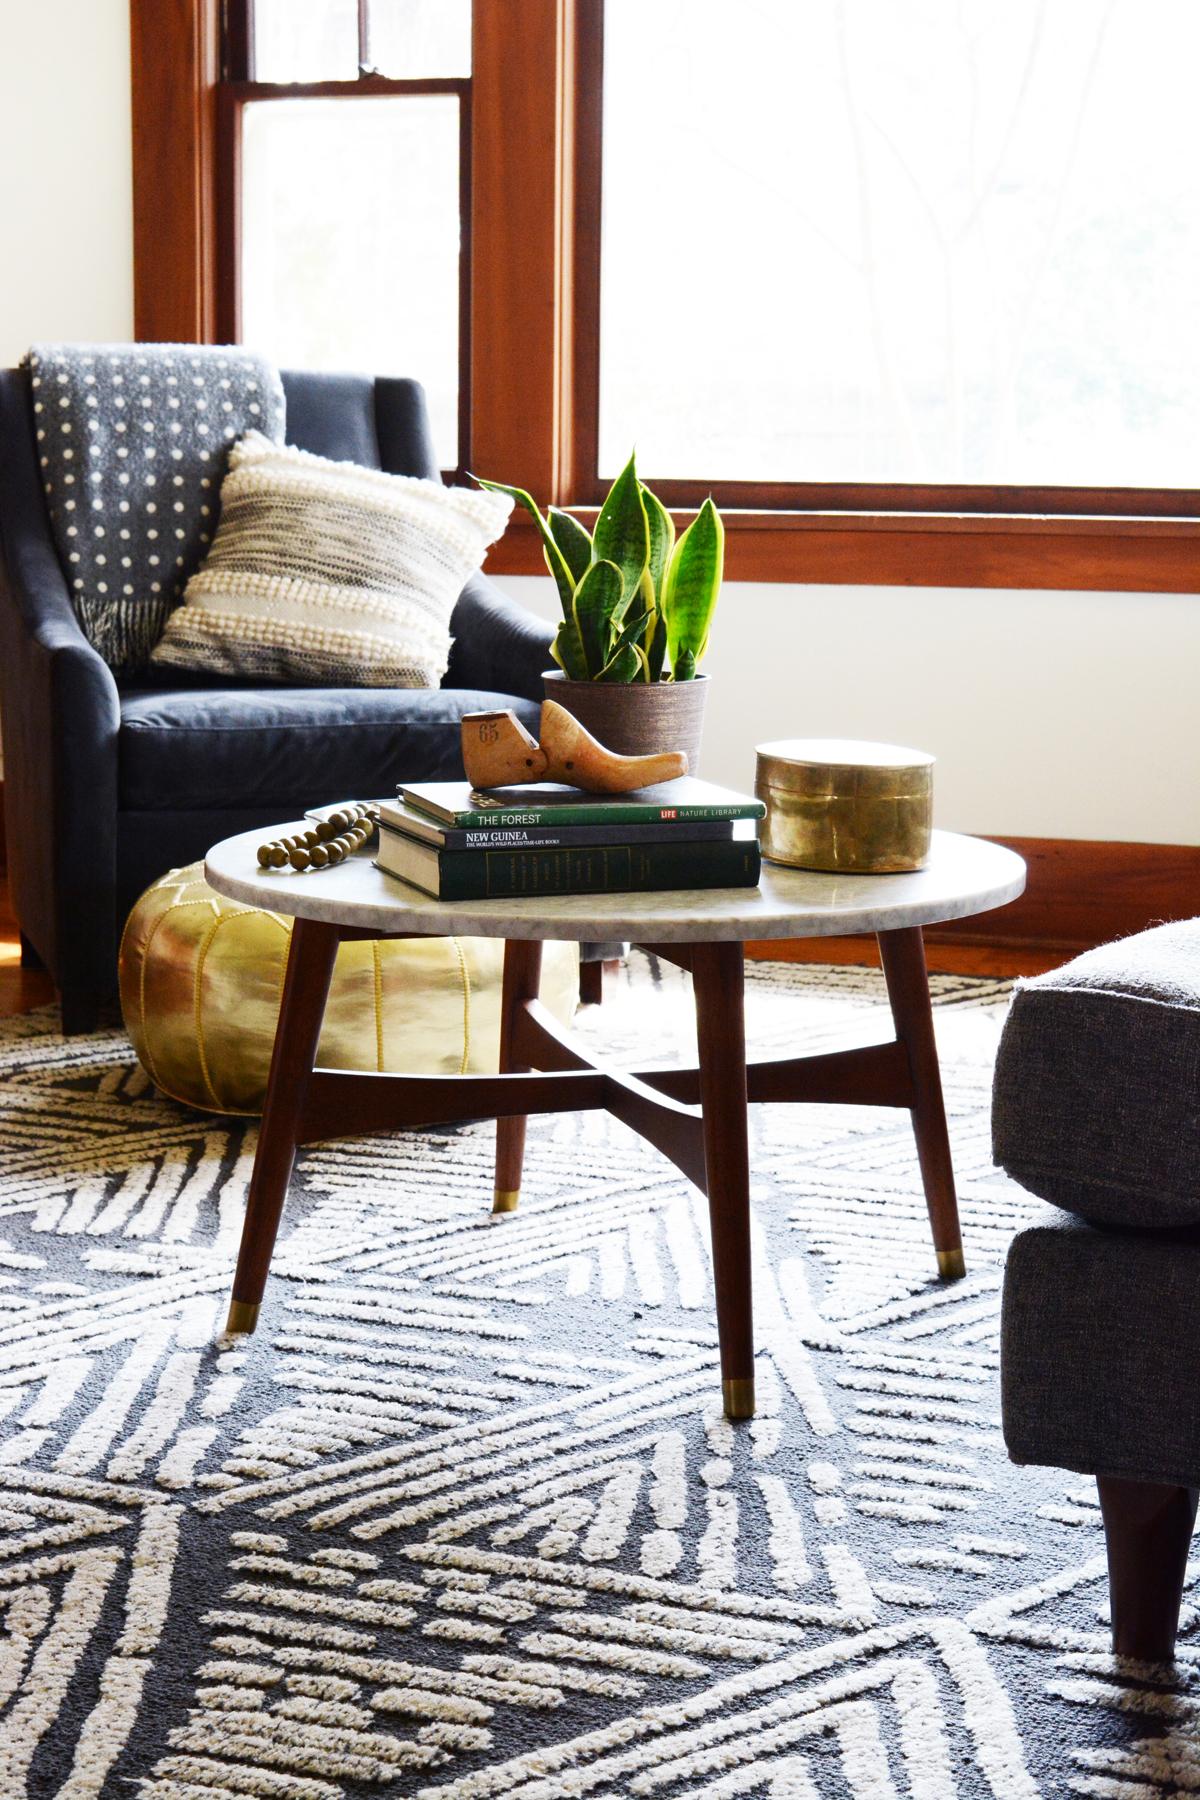 24 Stylish Coffee Tables Under $200